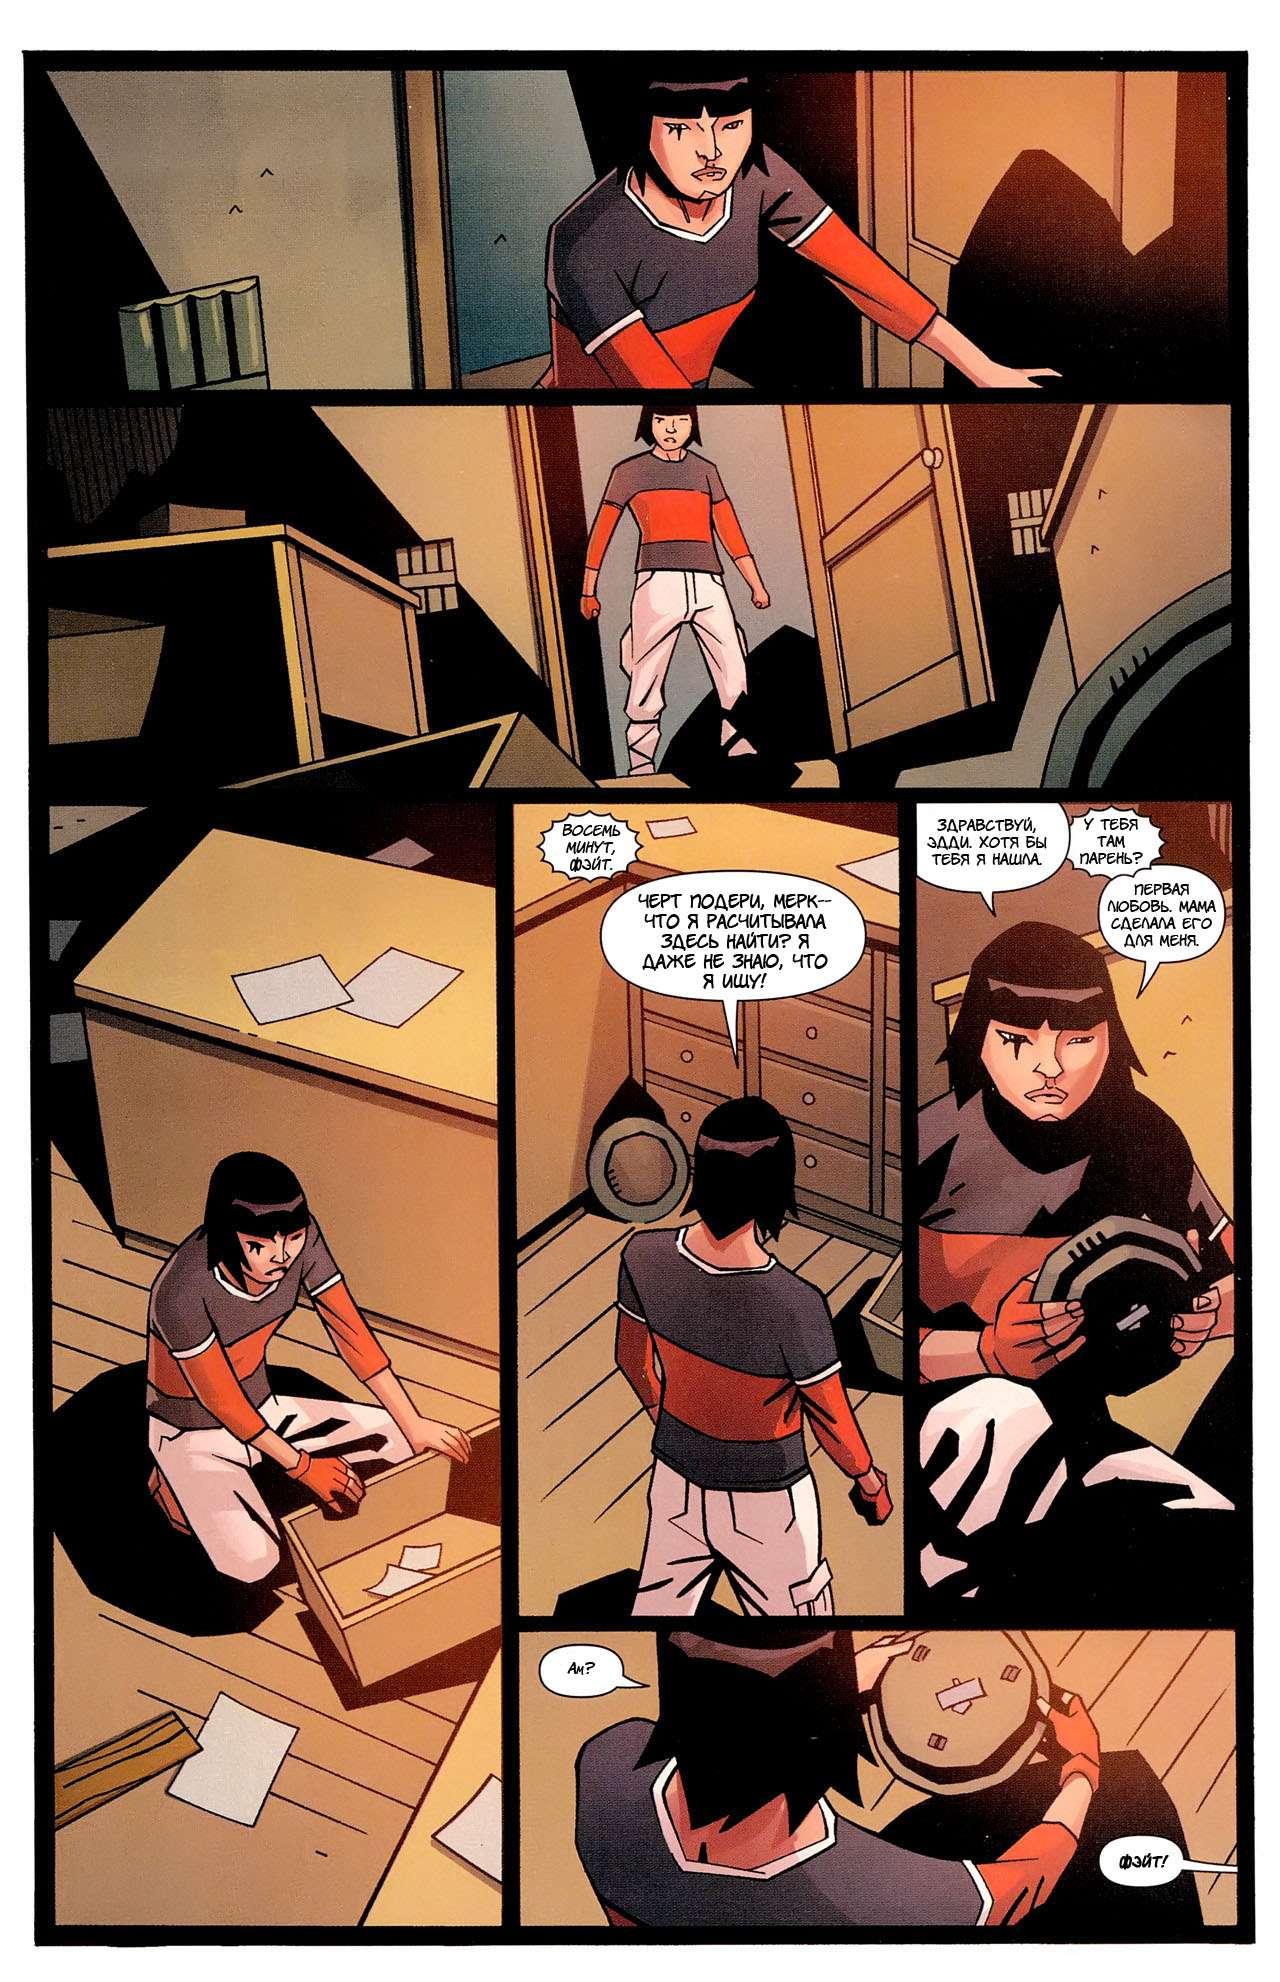 mirrors-edge-05-pg-28